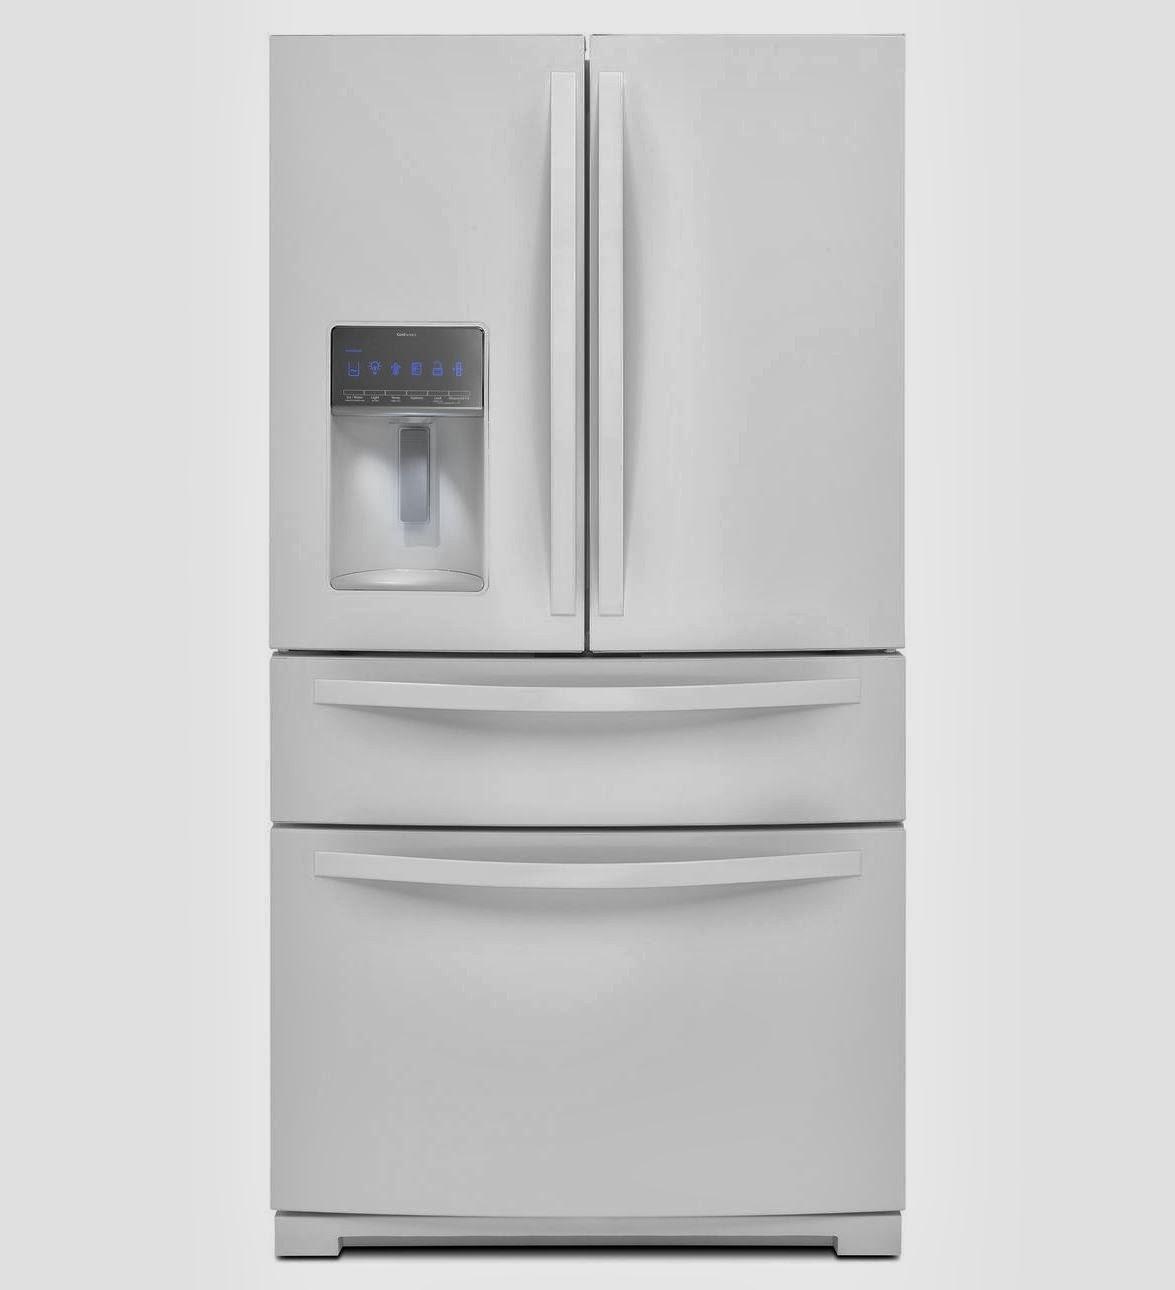 Whirlpool Refrigerator Brand: WRX988SIBW French Door ...